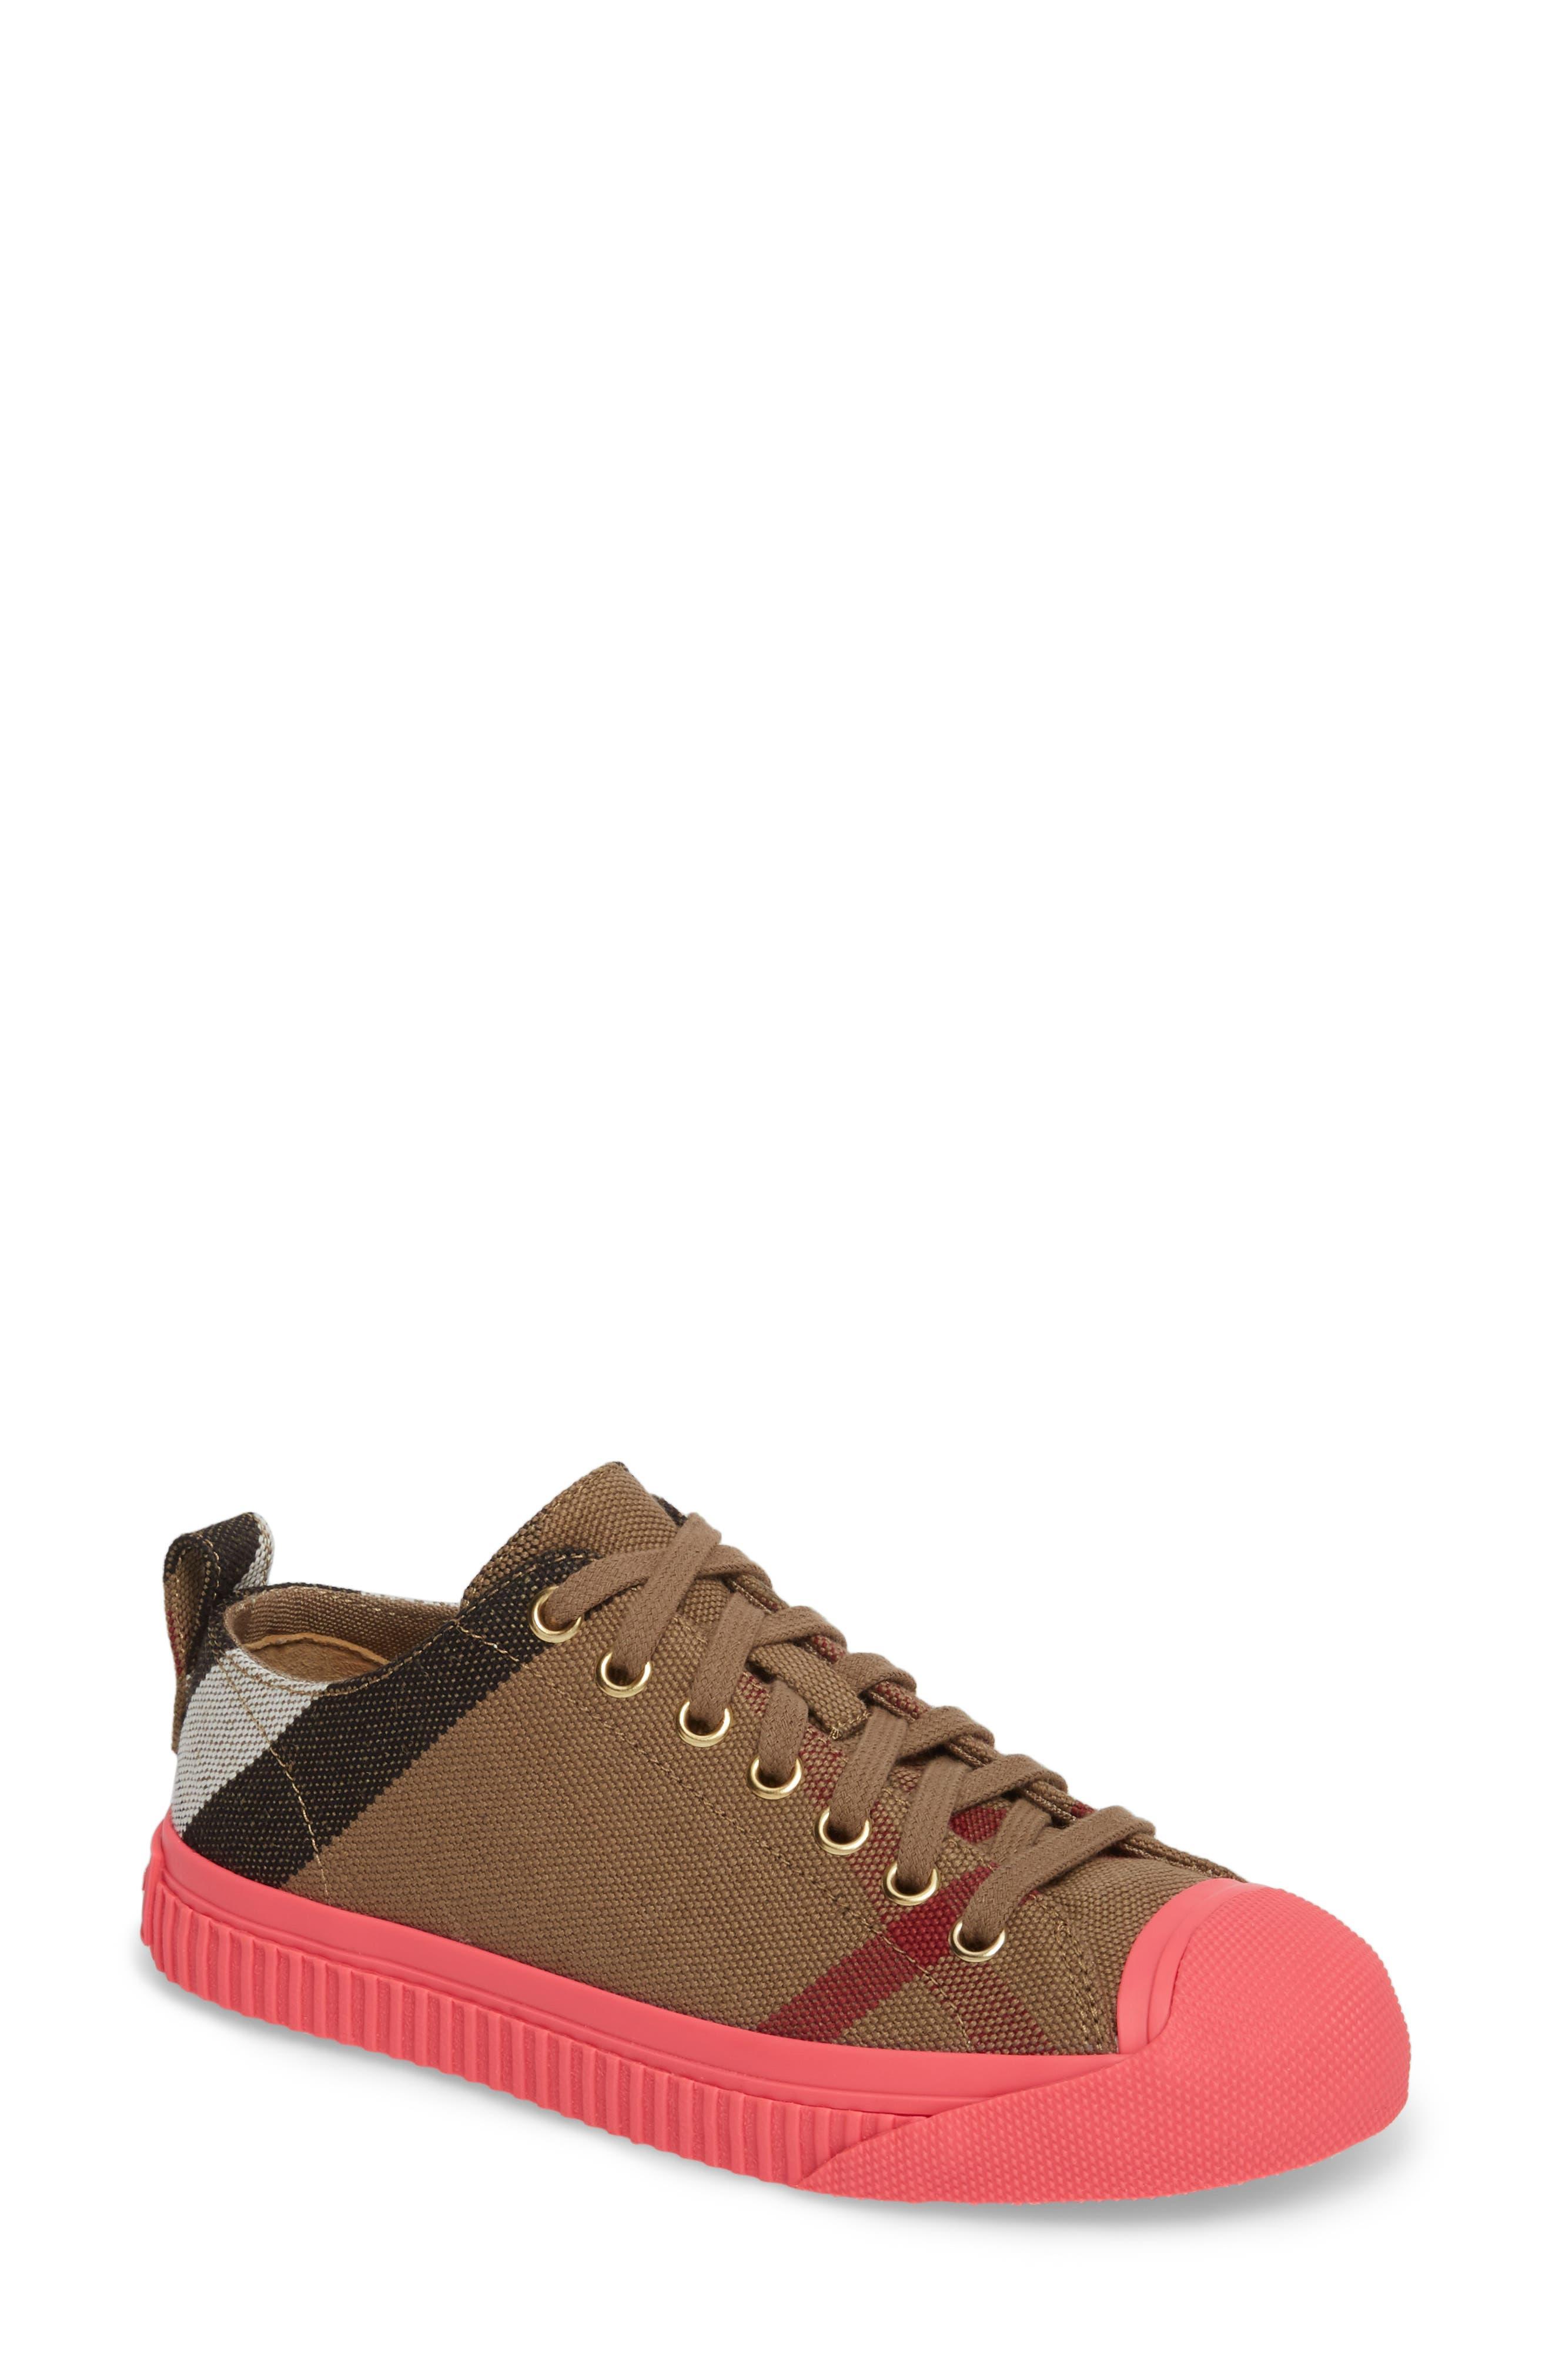 Bourne Sneaker,                             Main thumbnail 1, color,                             Classic Check